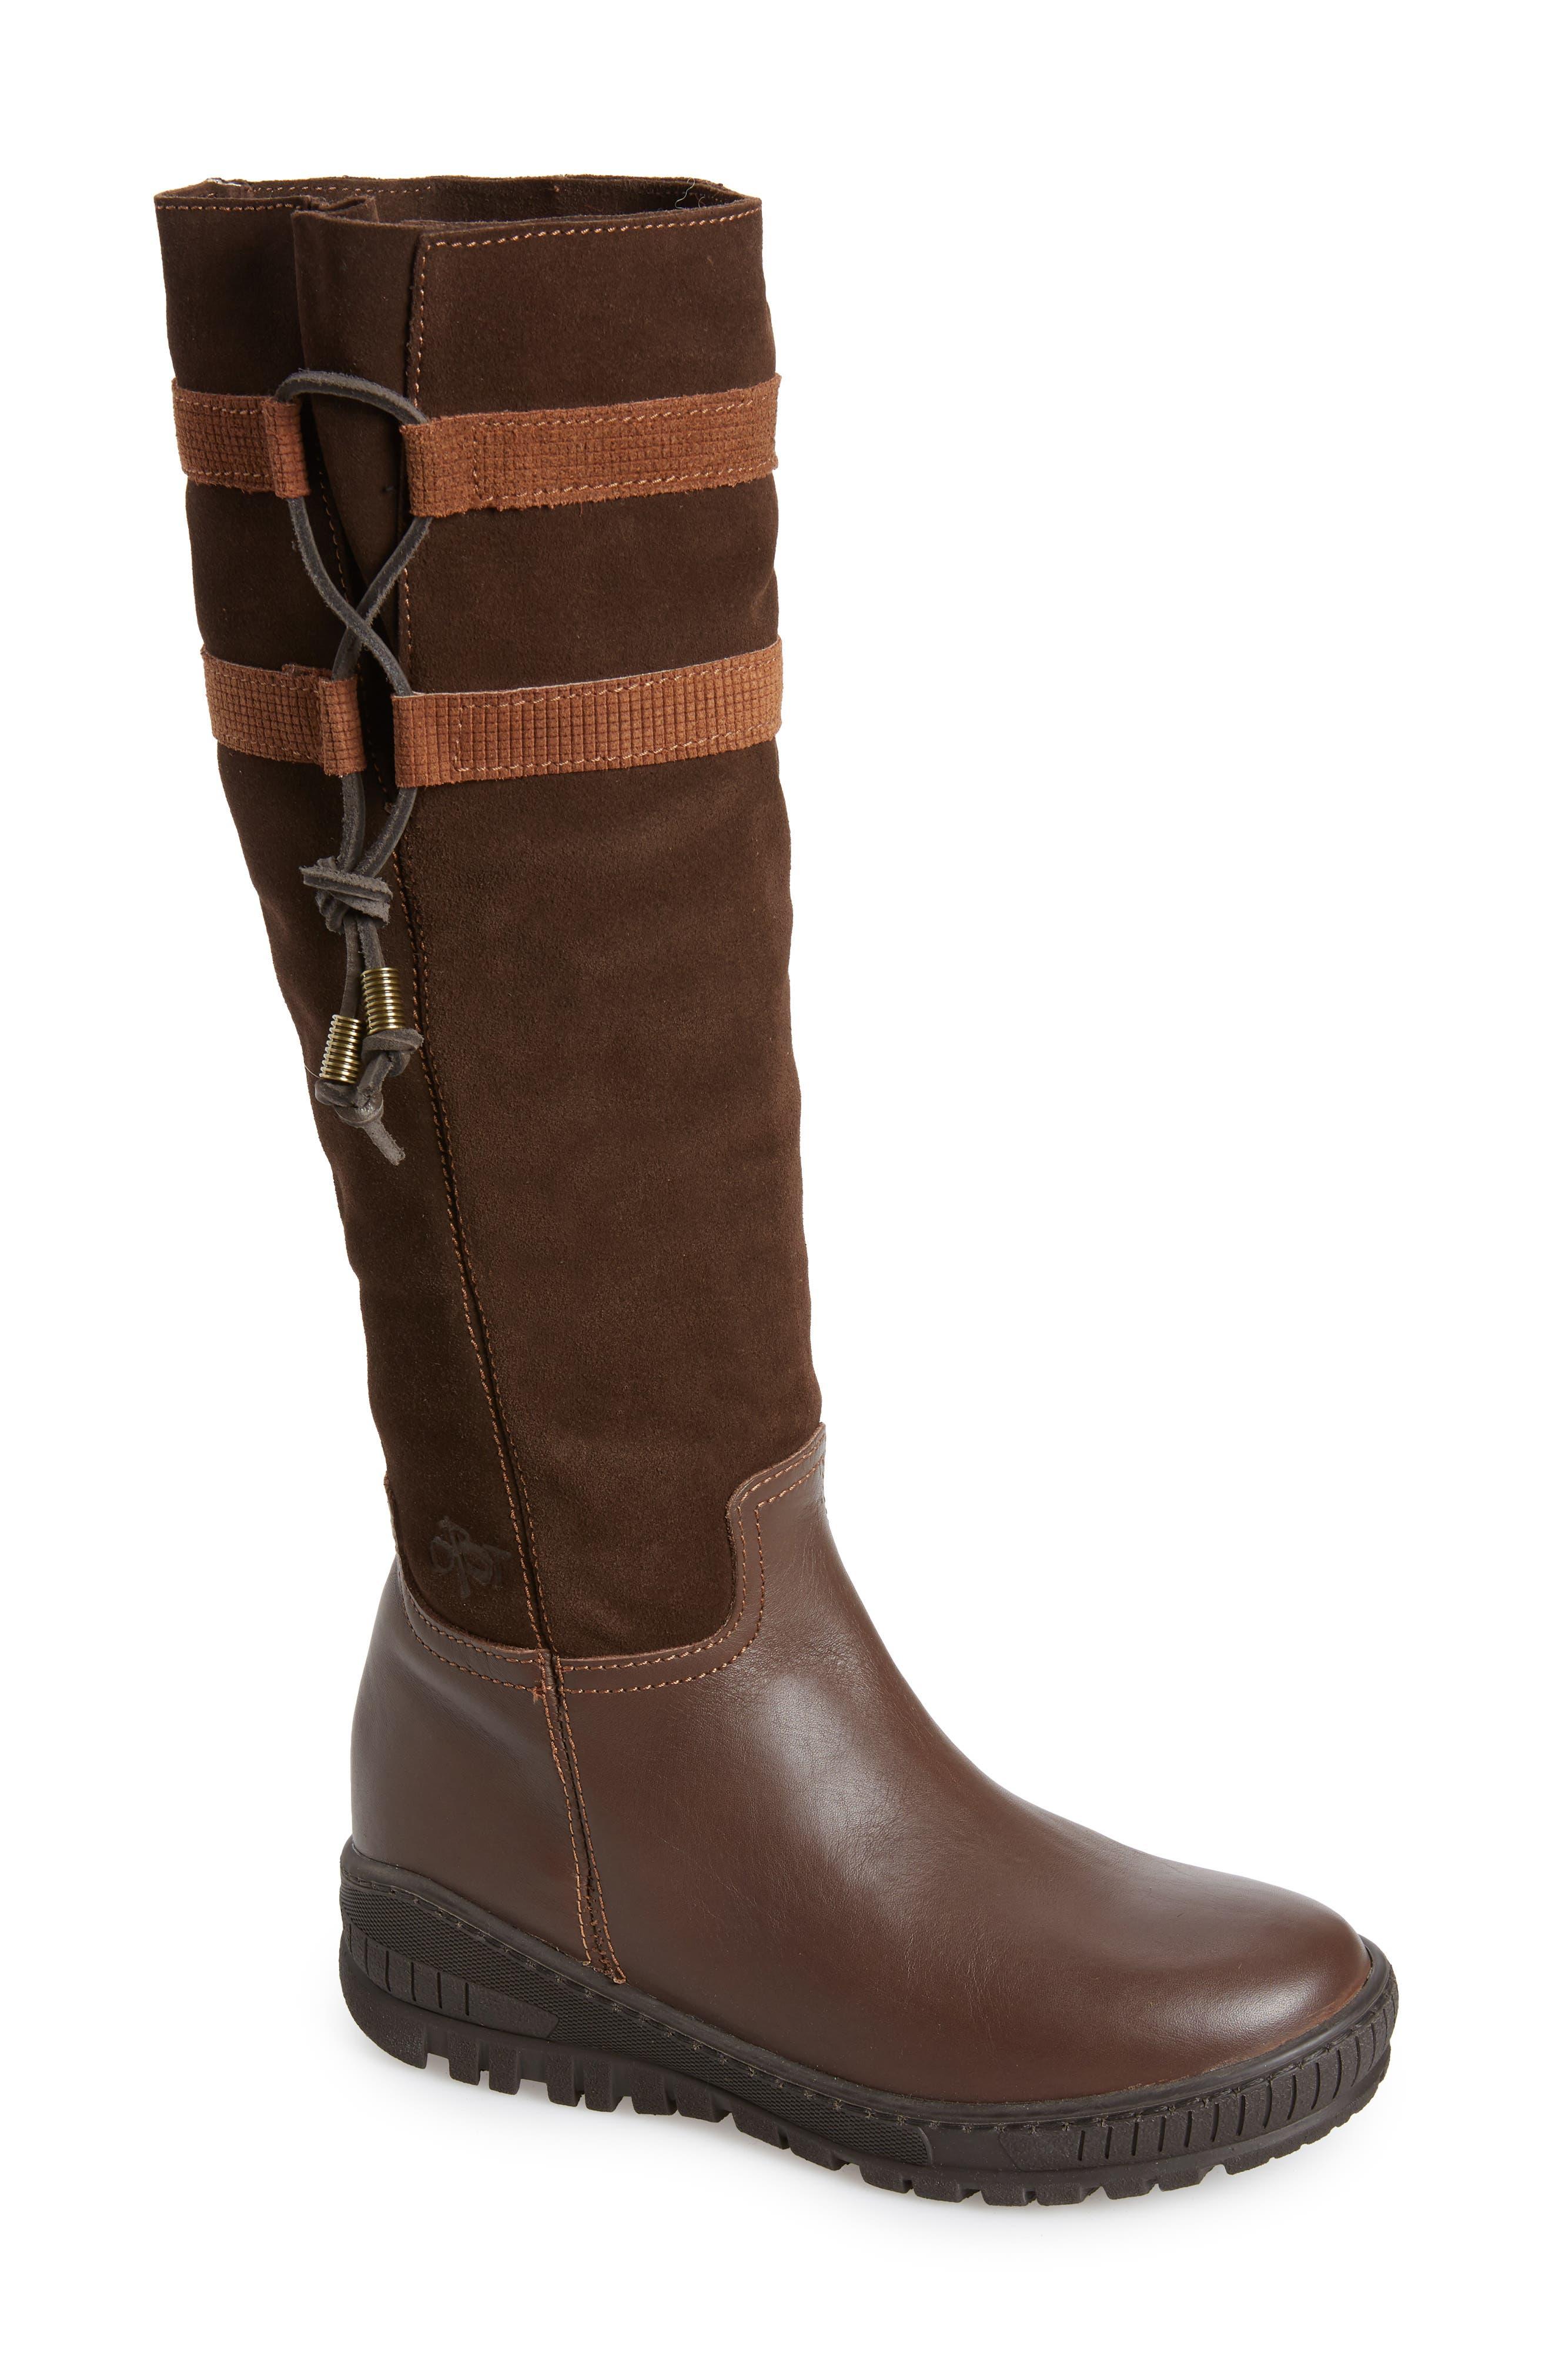 Otbt Move On Knee High Boot, Brown